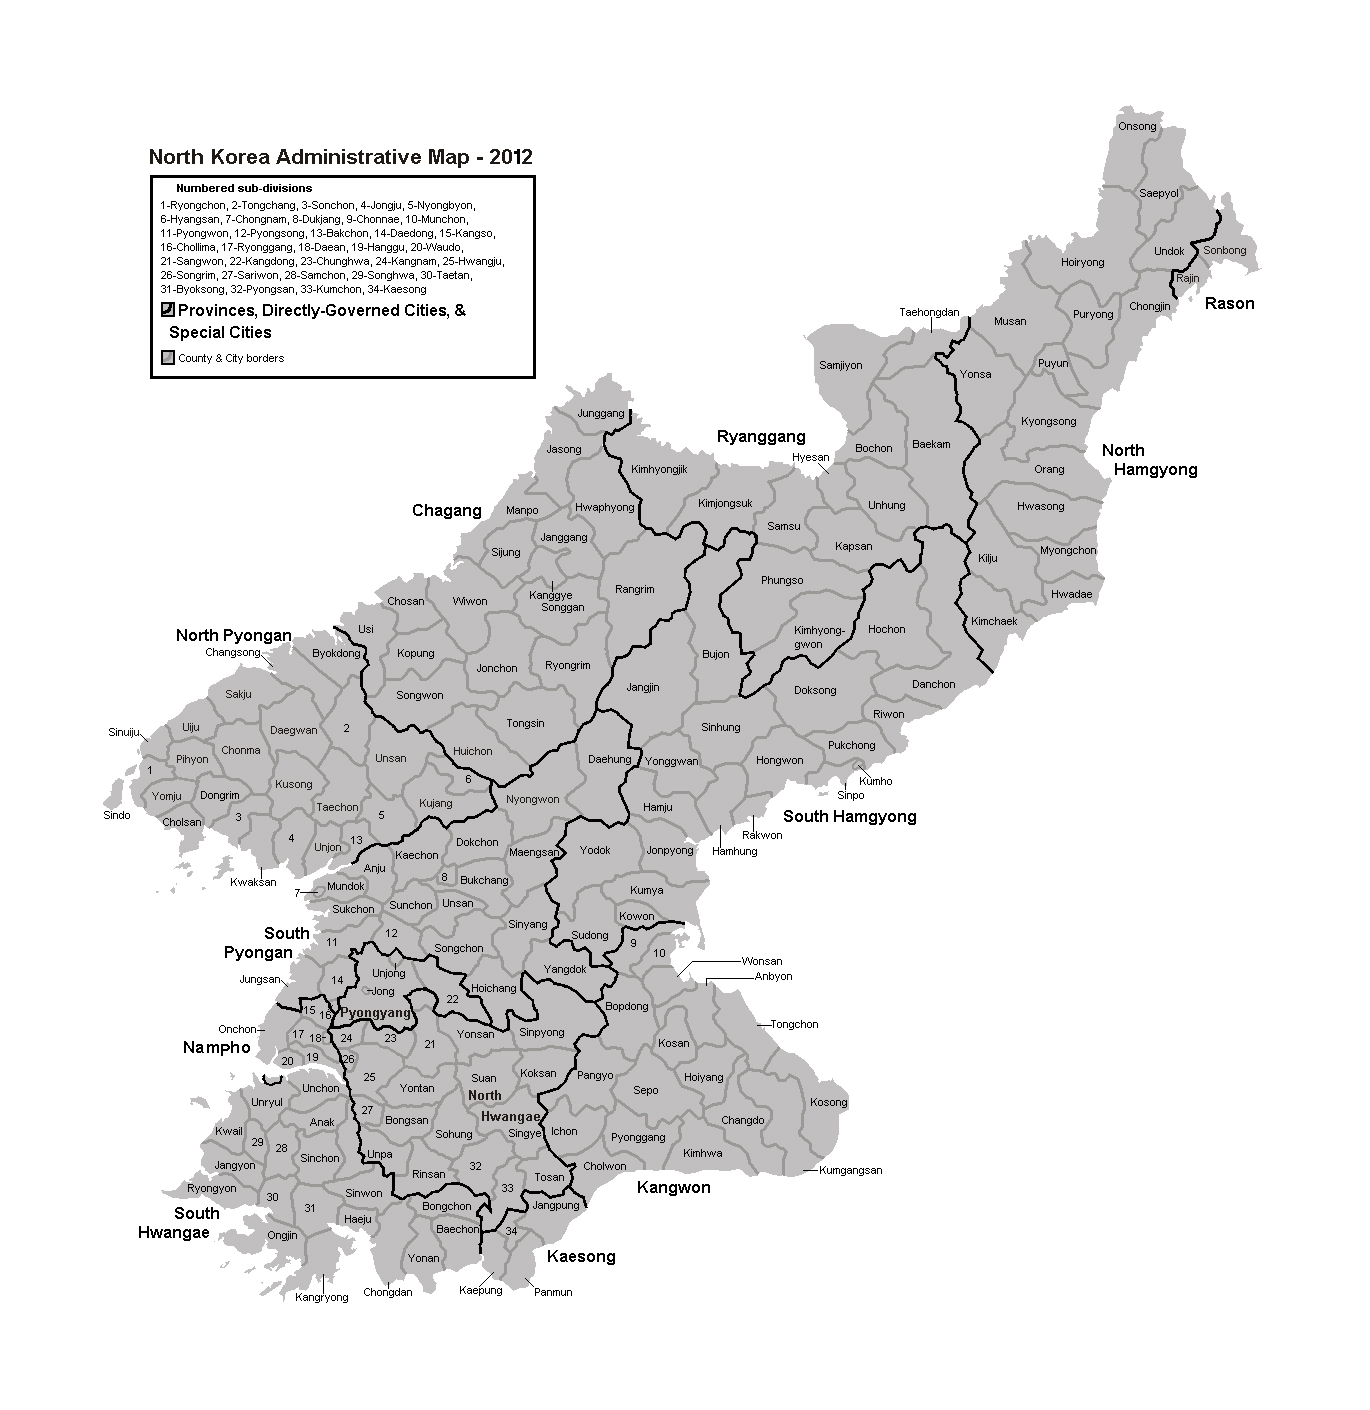 Administrative map of North Korea North Korea Asia Mapsland